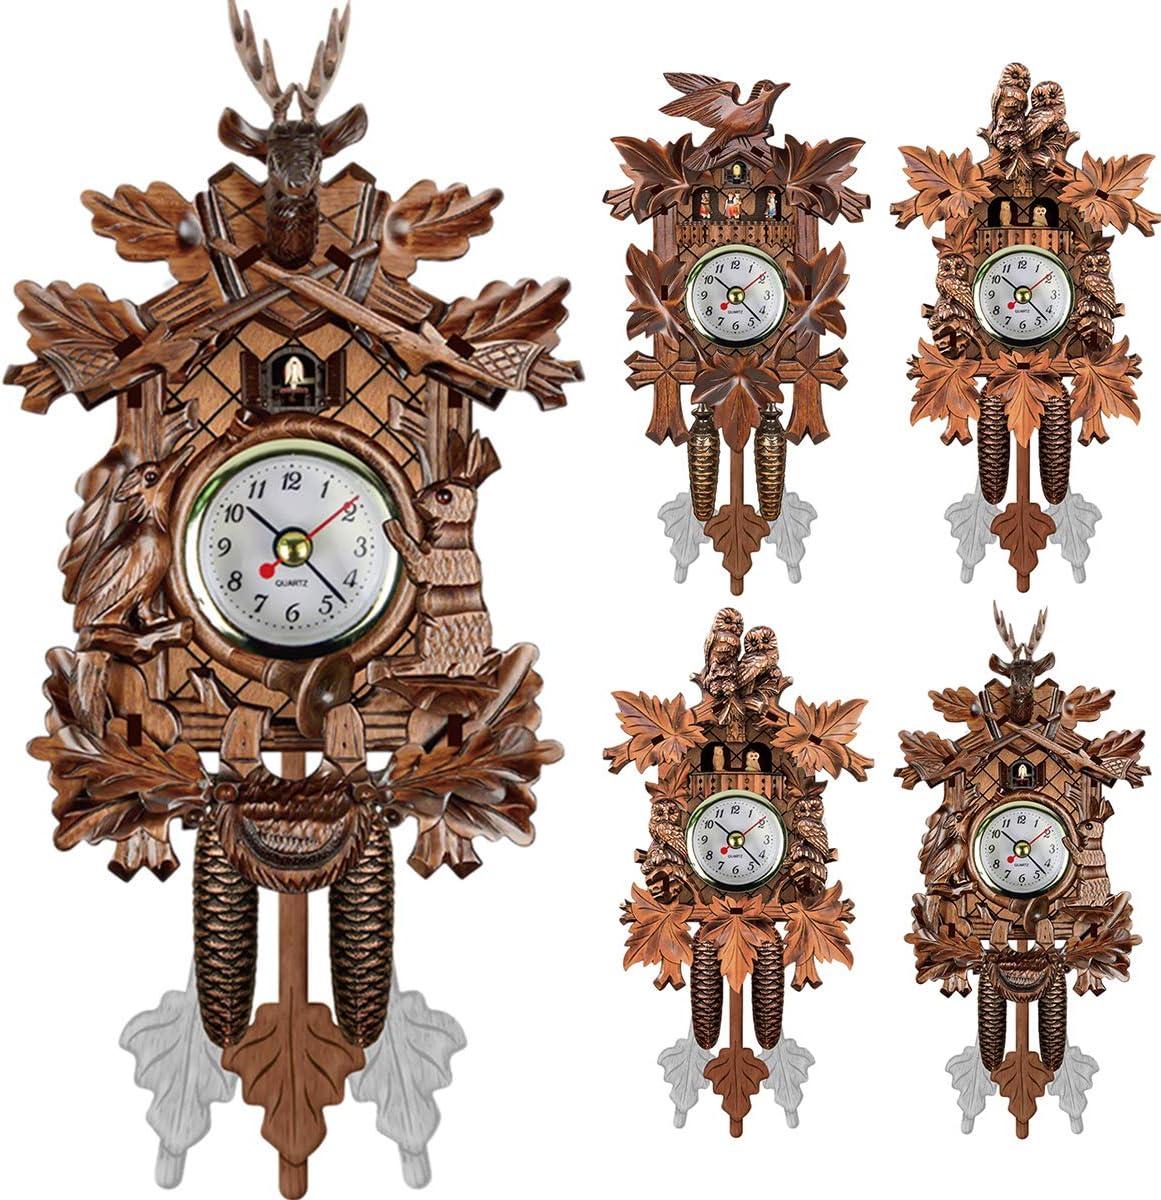 jskjlkl2019 Art Vintage Handcraft Wood Cuckoo Clock House Tree Style Wall Clock Home Decor